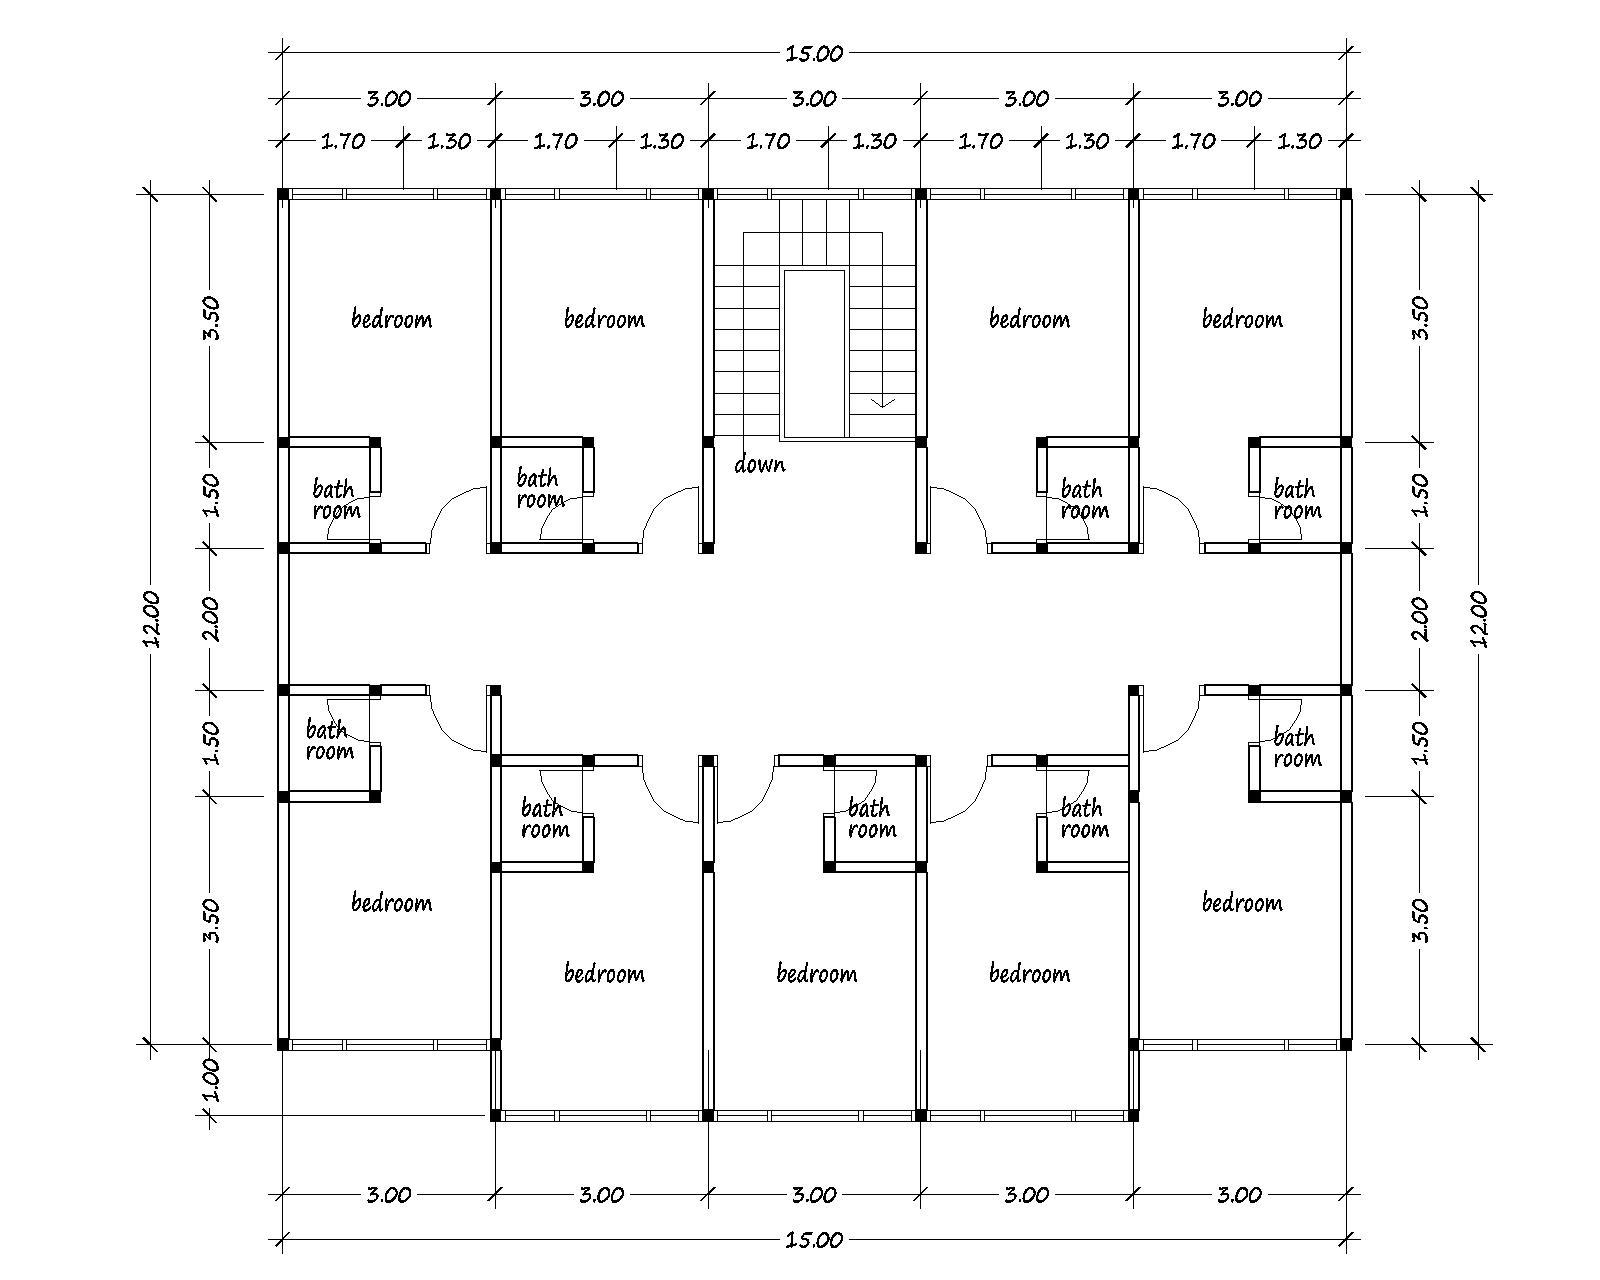 boarding%2Bhouse%2Bplan%2B0001b boarding house plans,Boarding House Plans